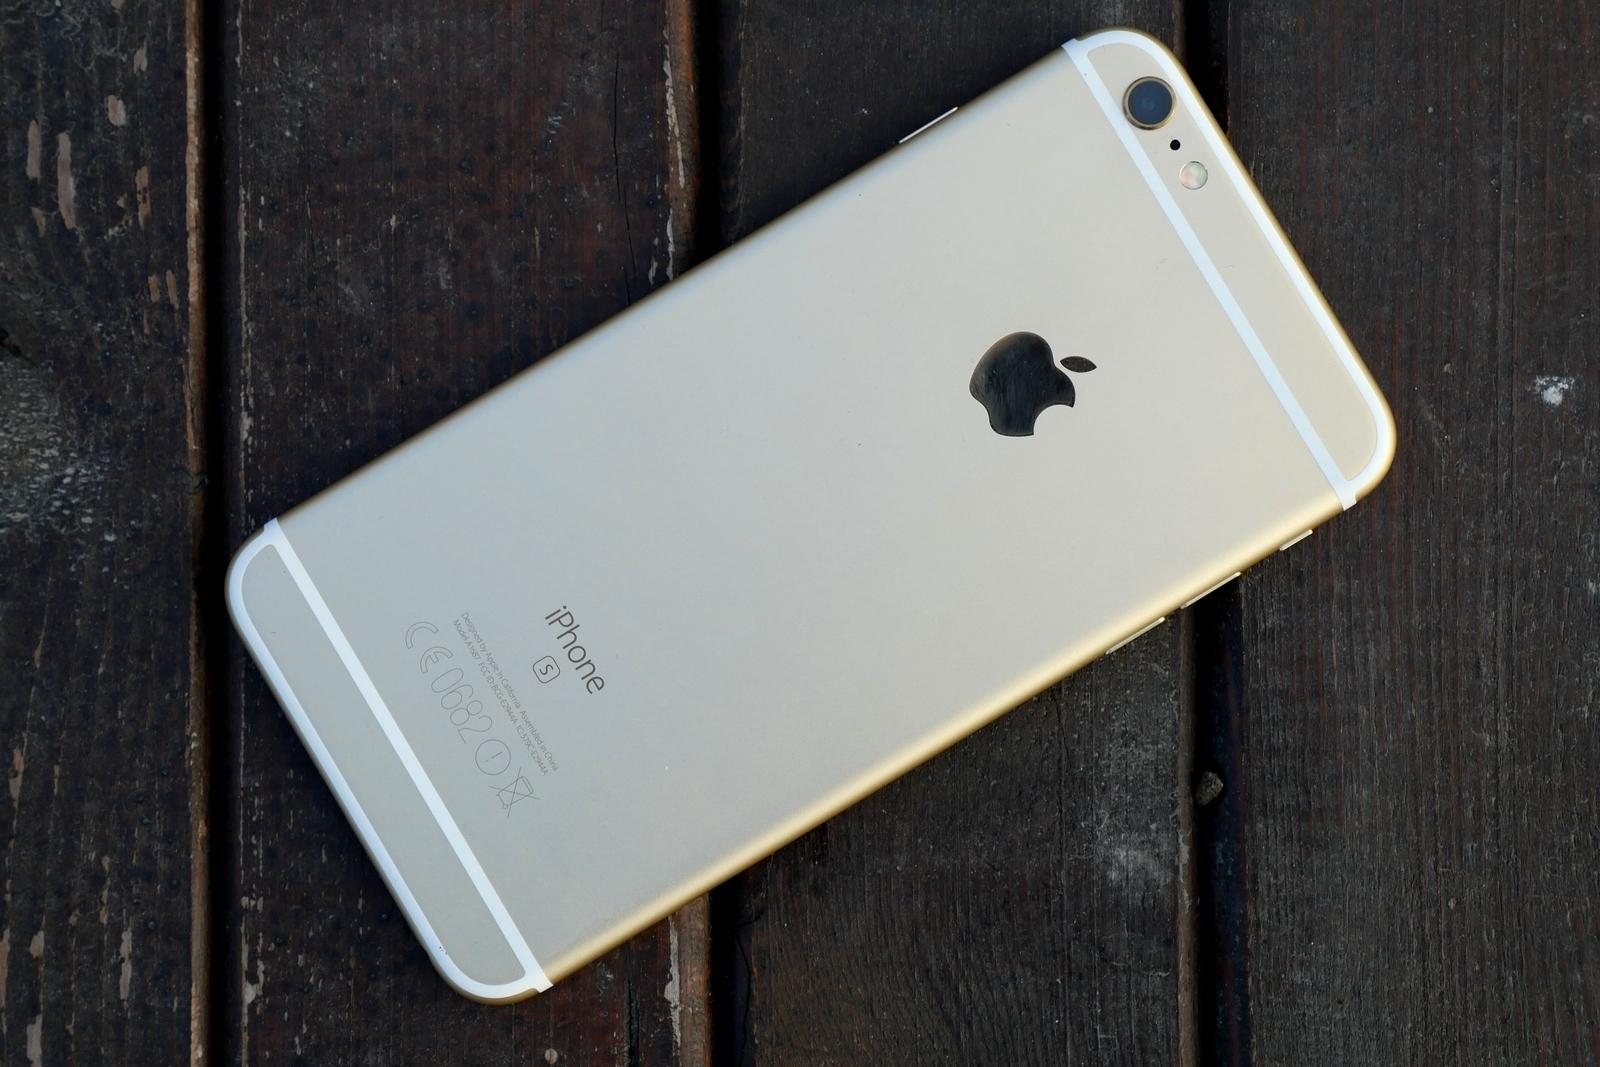 iphone 6 plus характеристики камеры